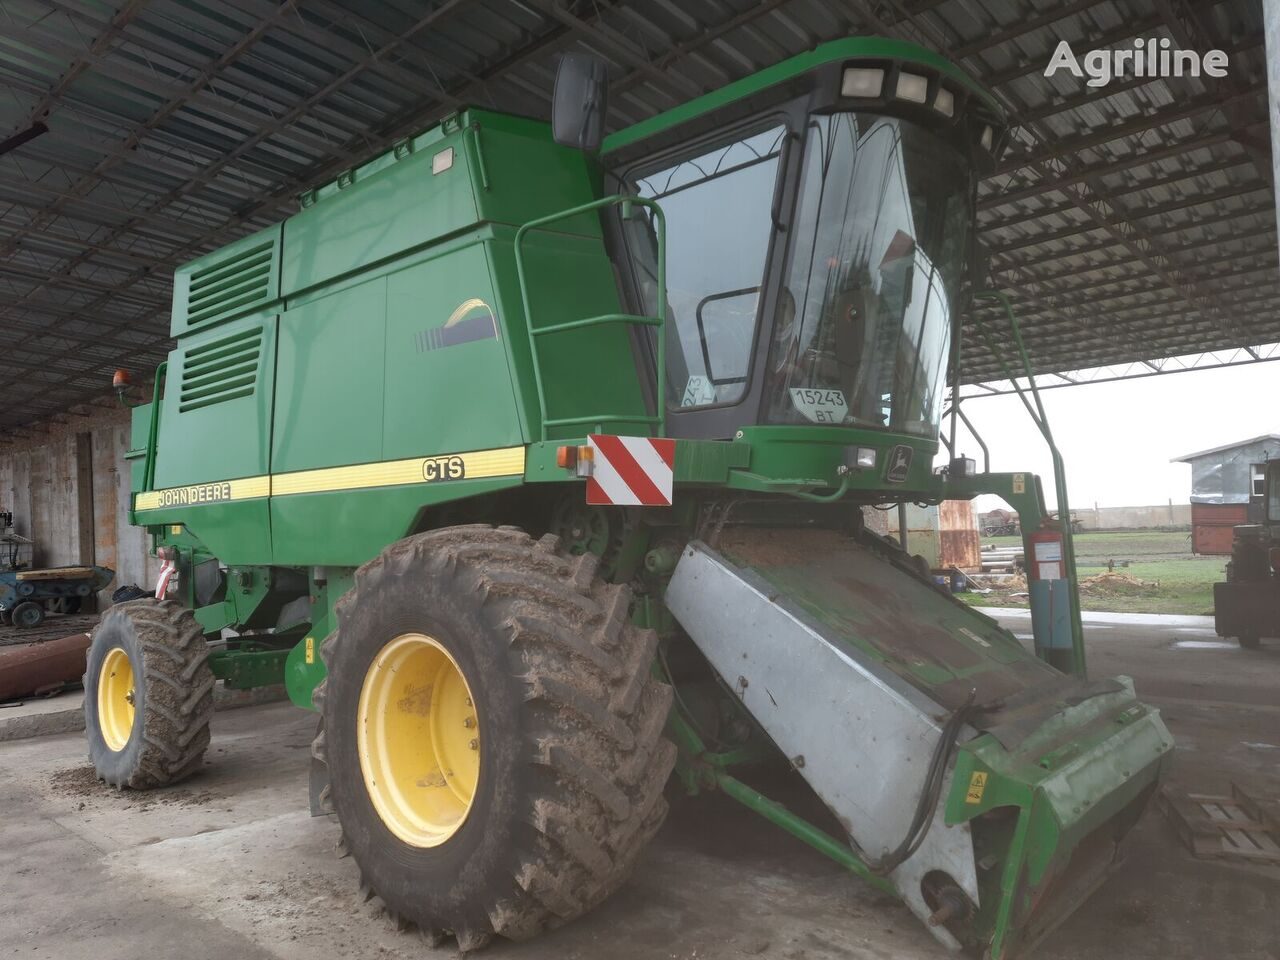 JOHN DEERE CTS grain harvester